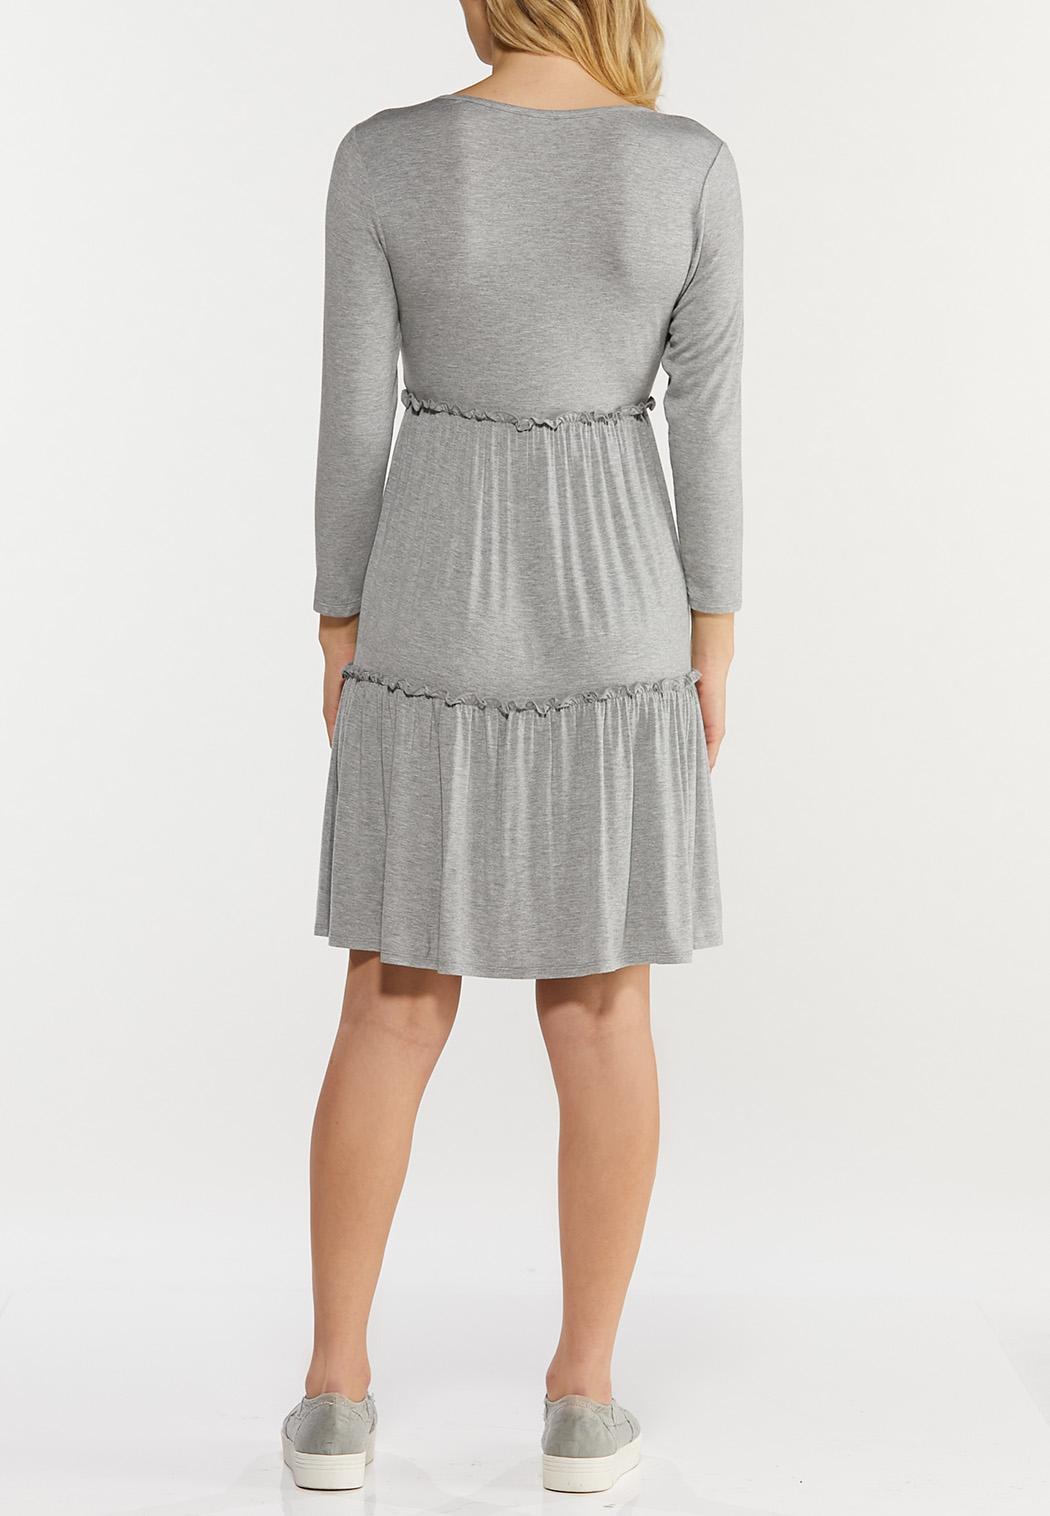 Plus Size Gray Ruffled Babydoll Dress (Item #44500370)